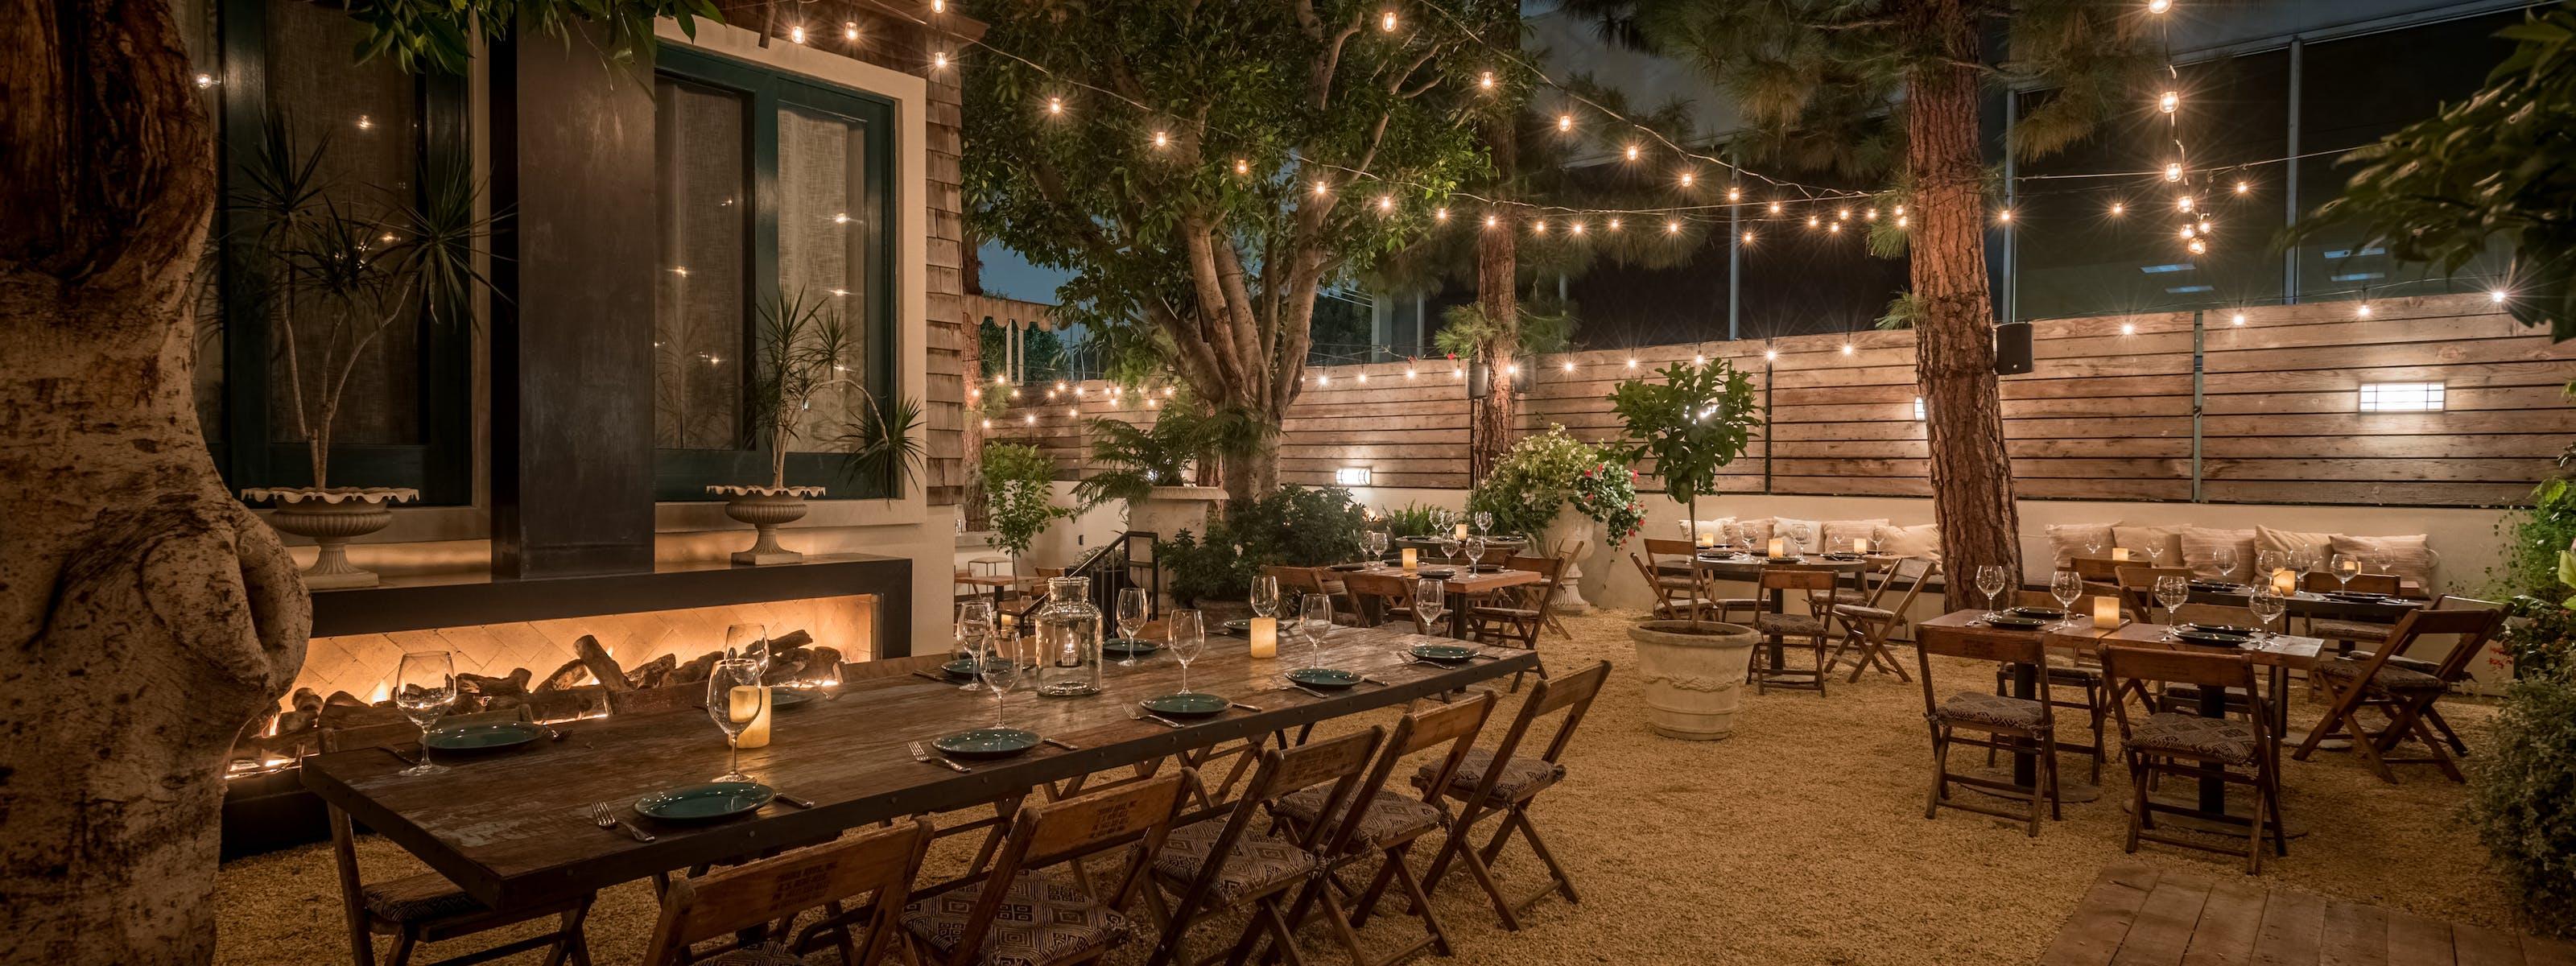 Where To Eat Outside In Santa Monica - Santa Monica - Los Angeles - The Infatuation